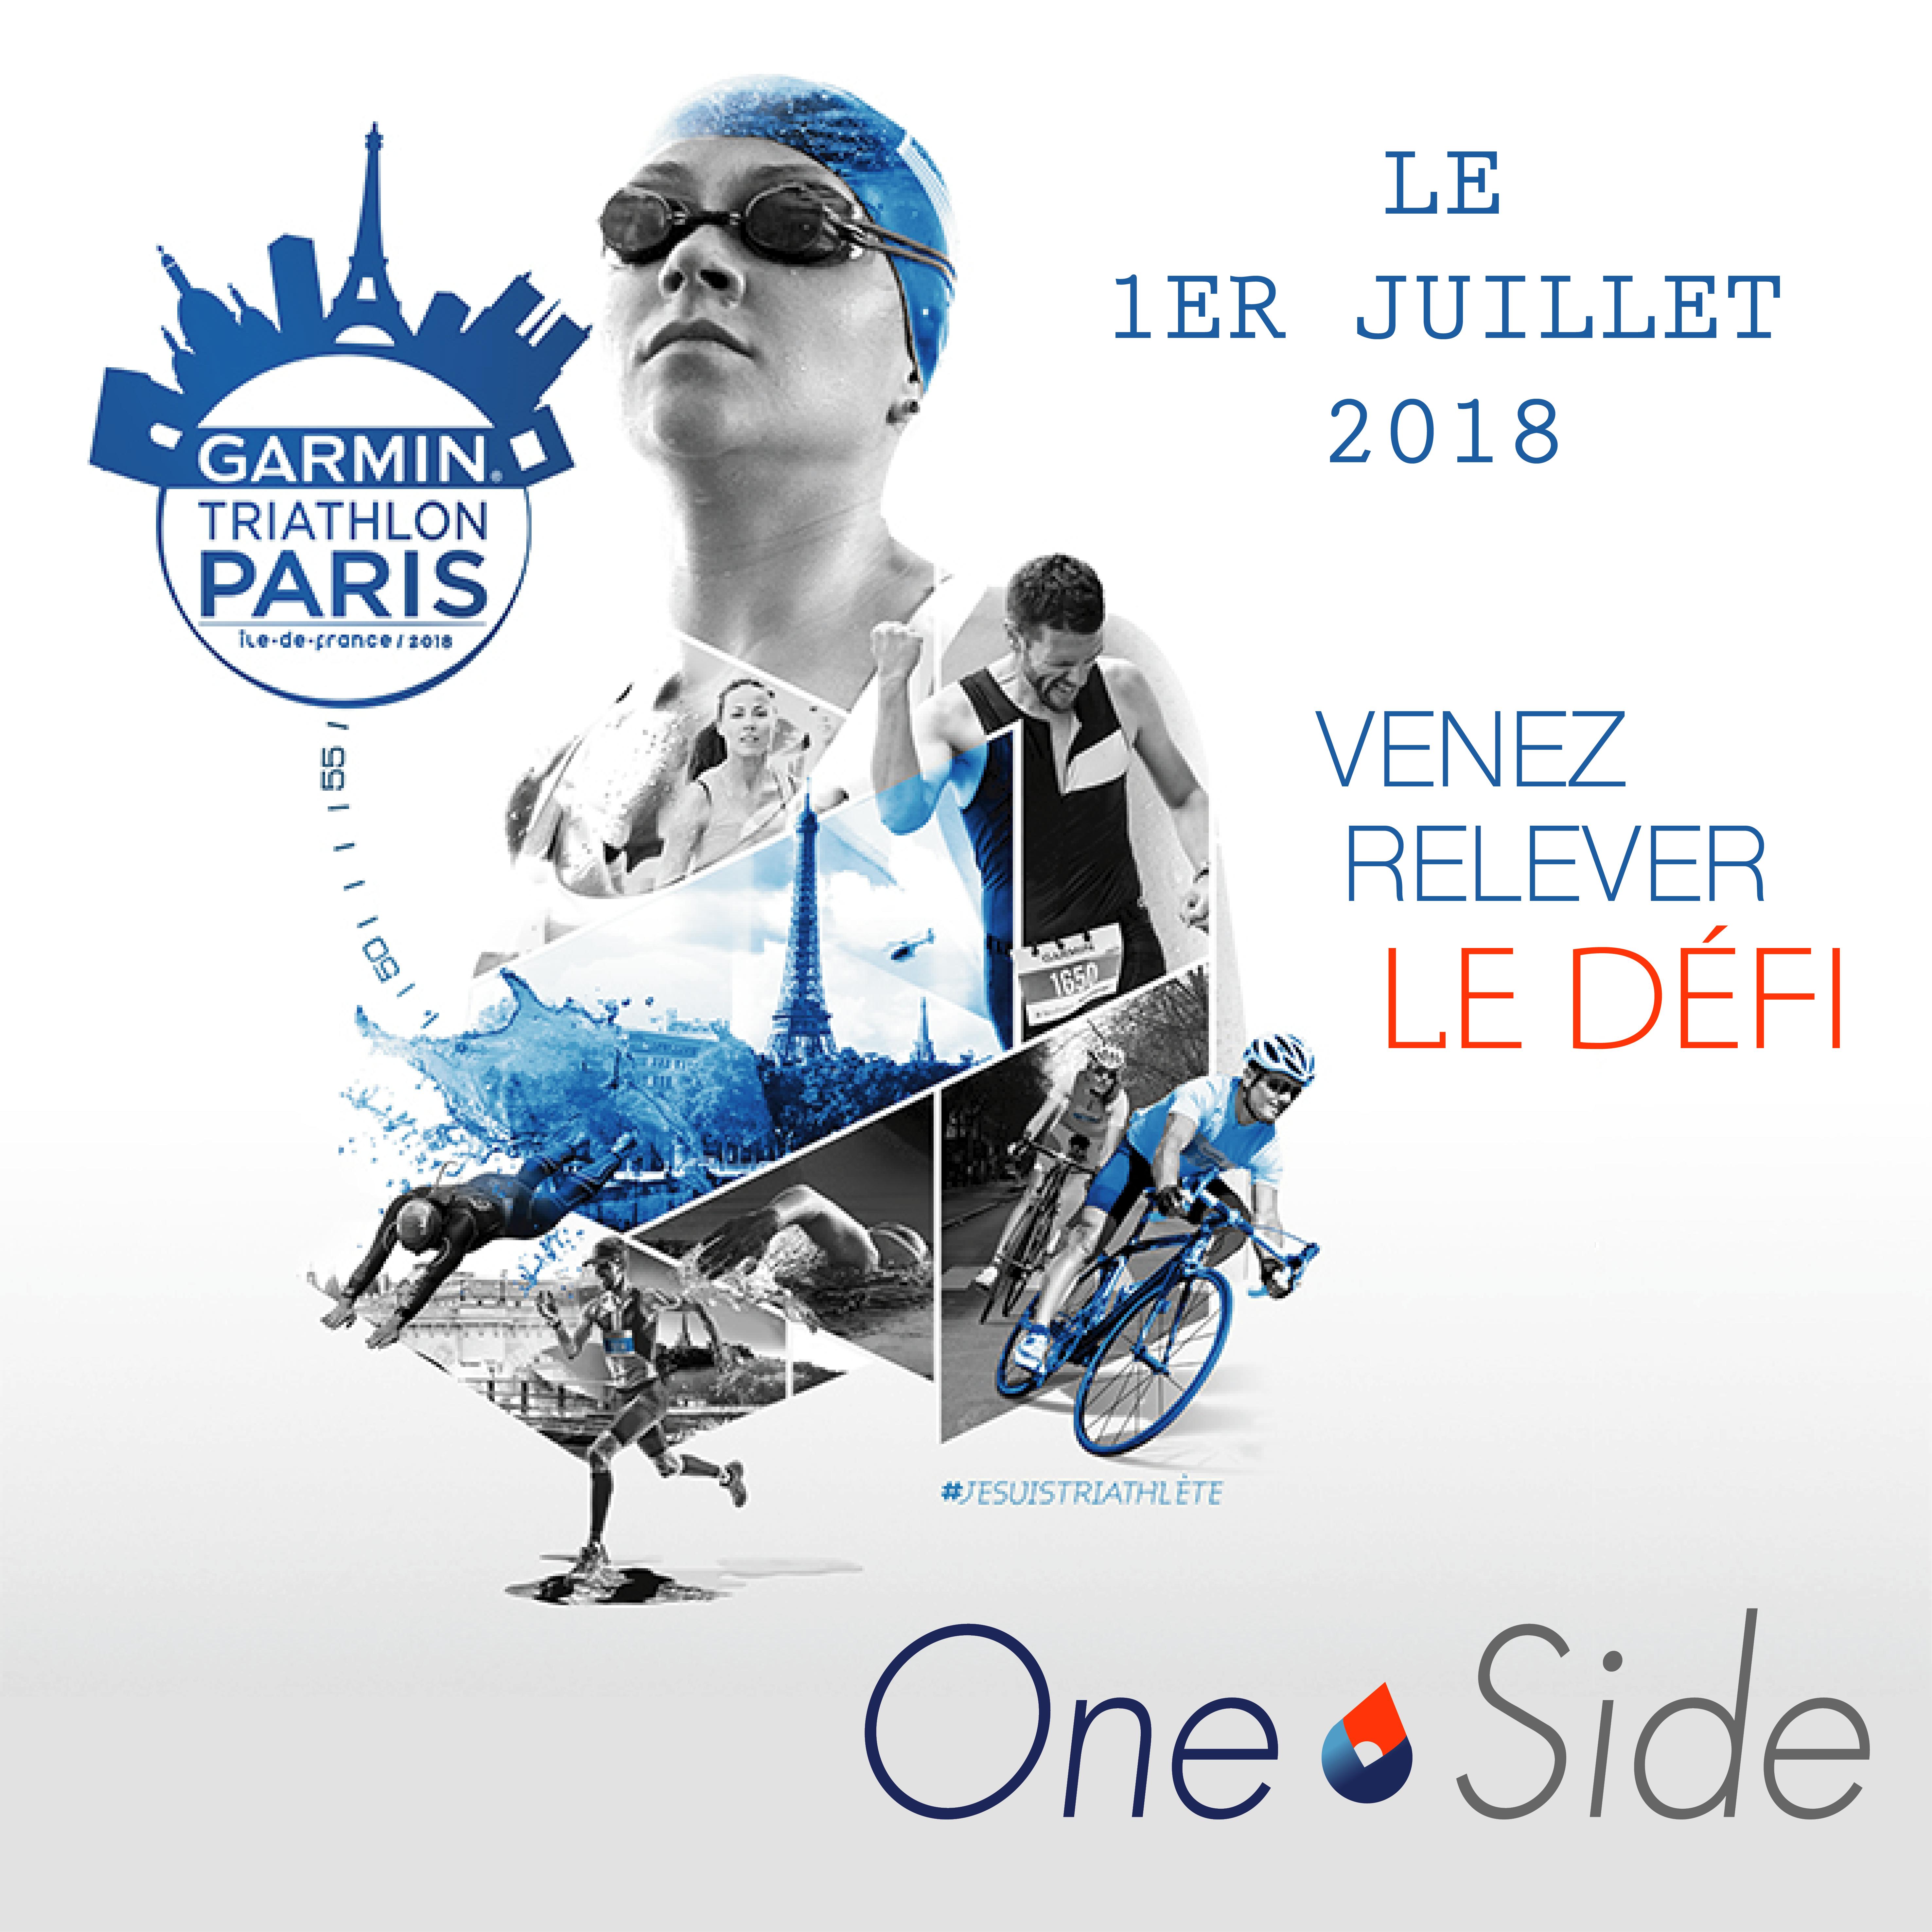 triathlon 1 juillet 2018